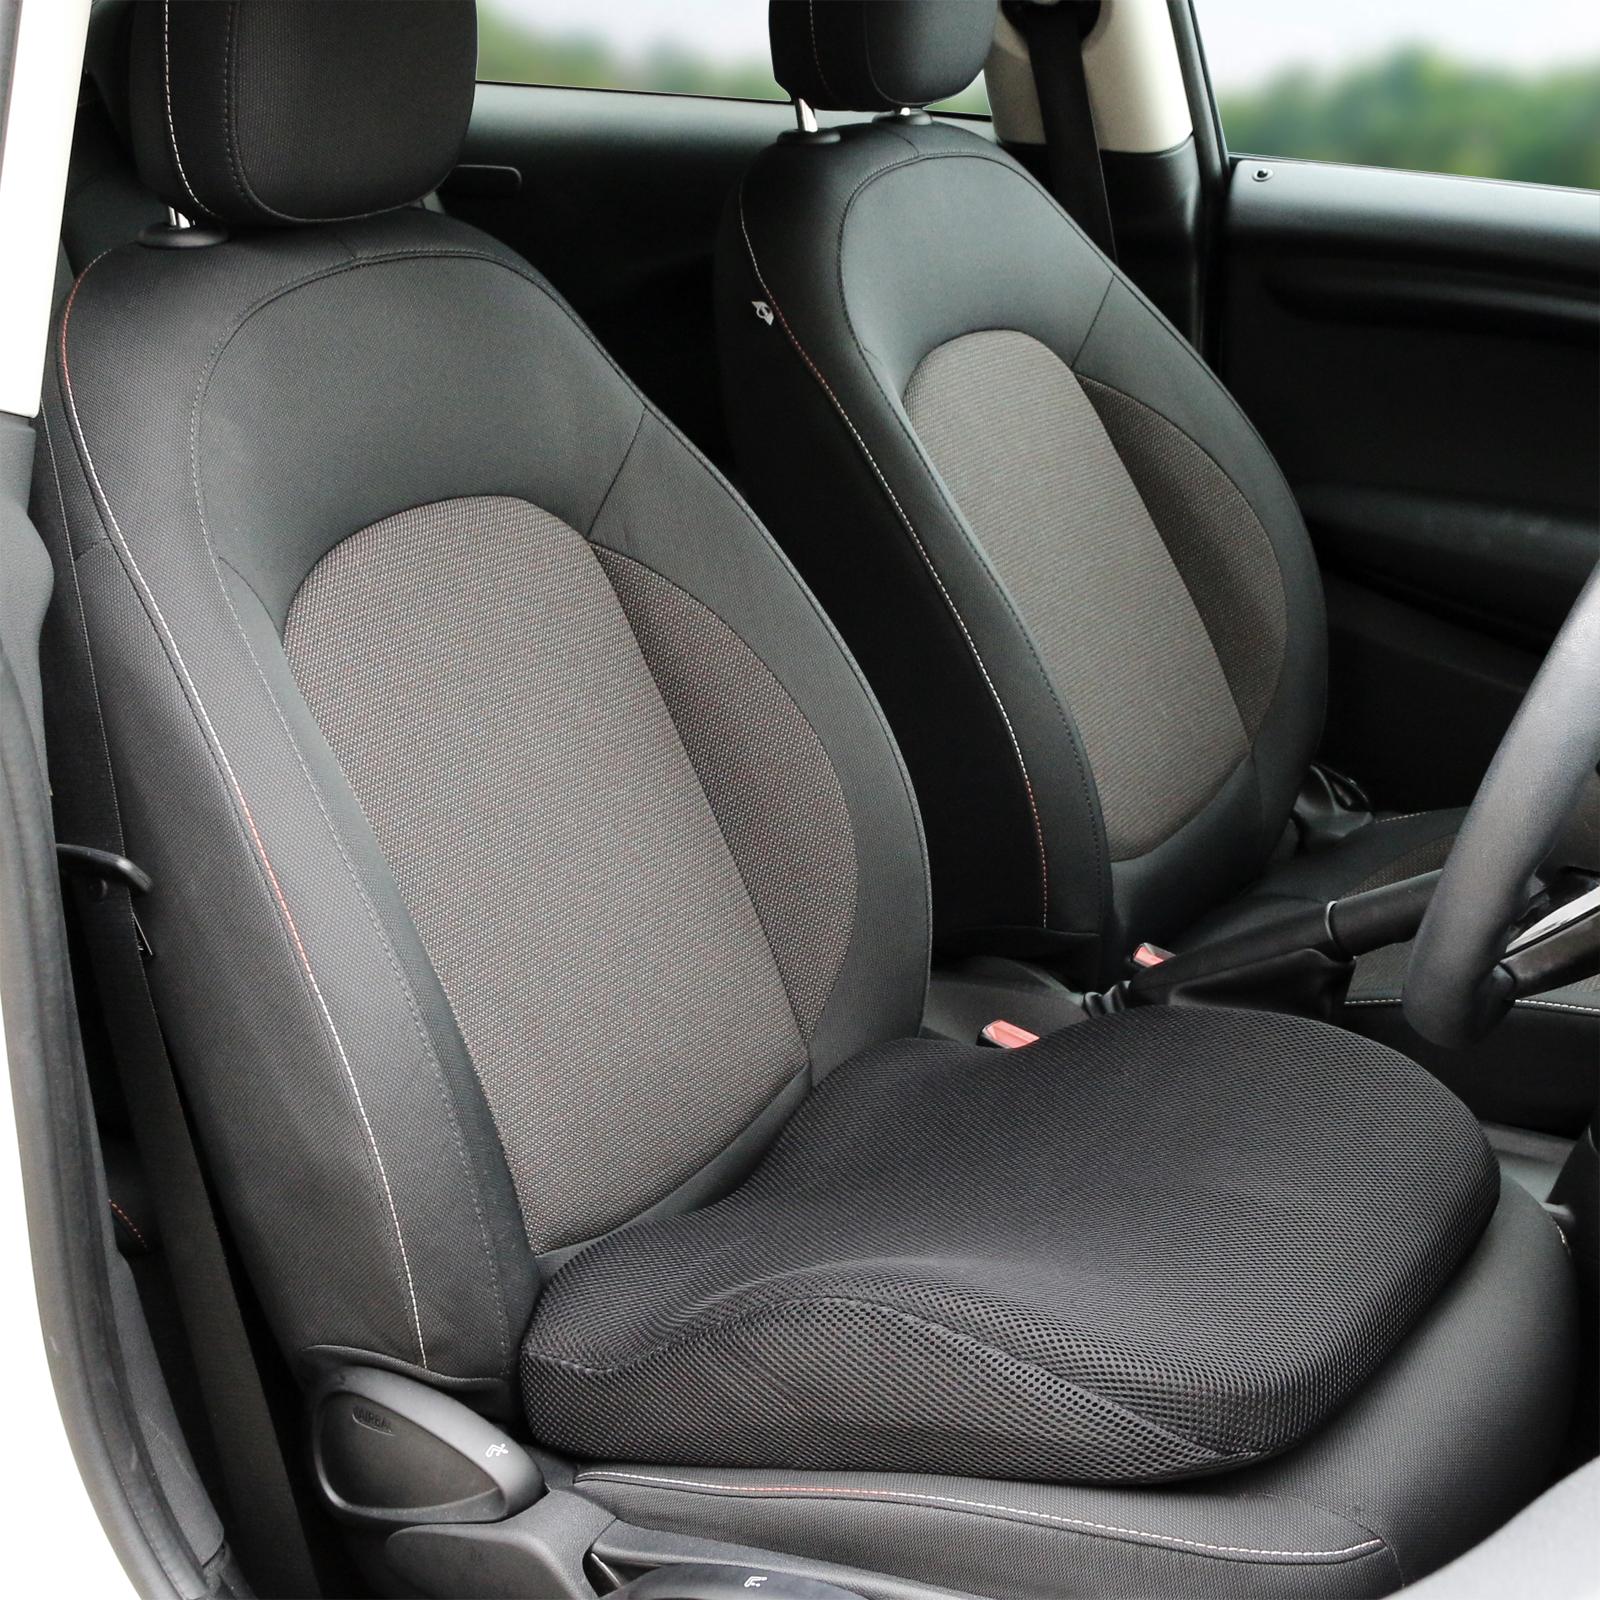 Black Memory Foam Lower Seat Base Posture Support Seat Cushion Car